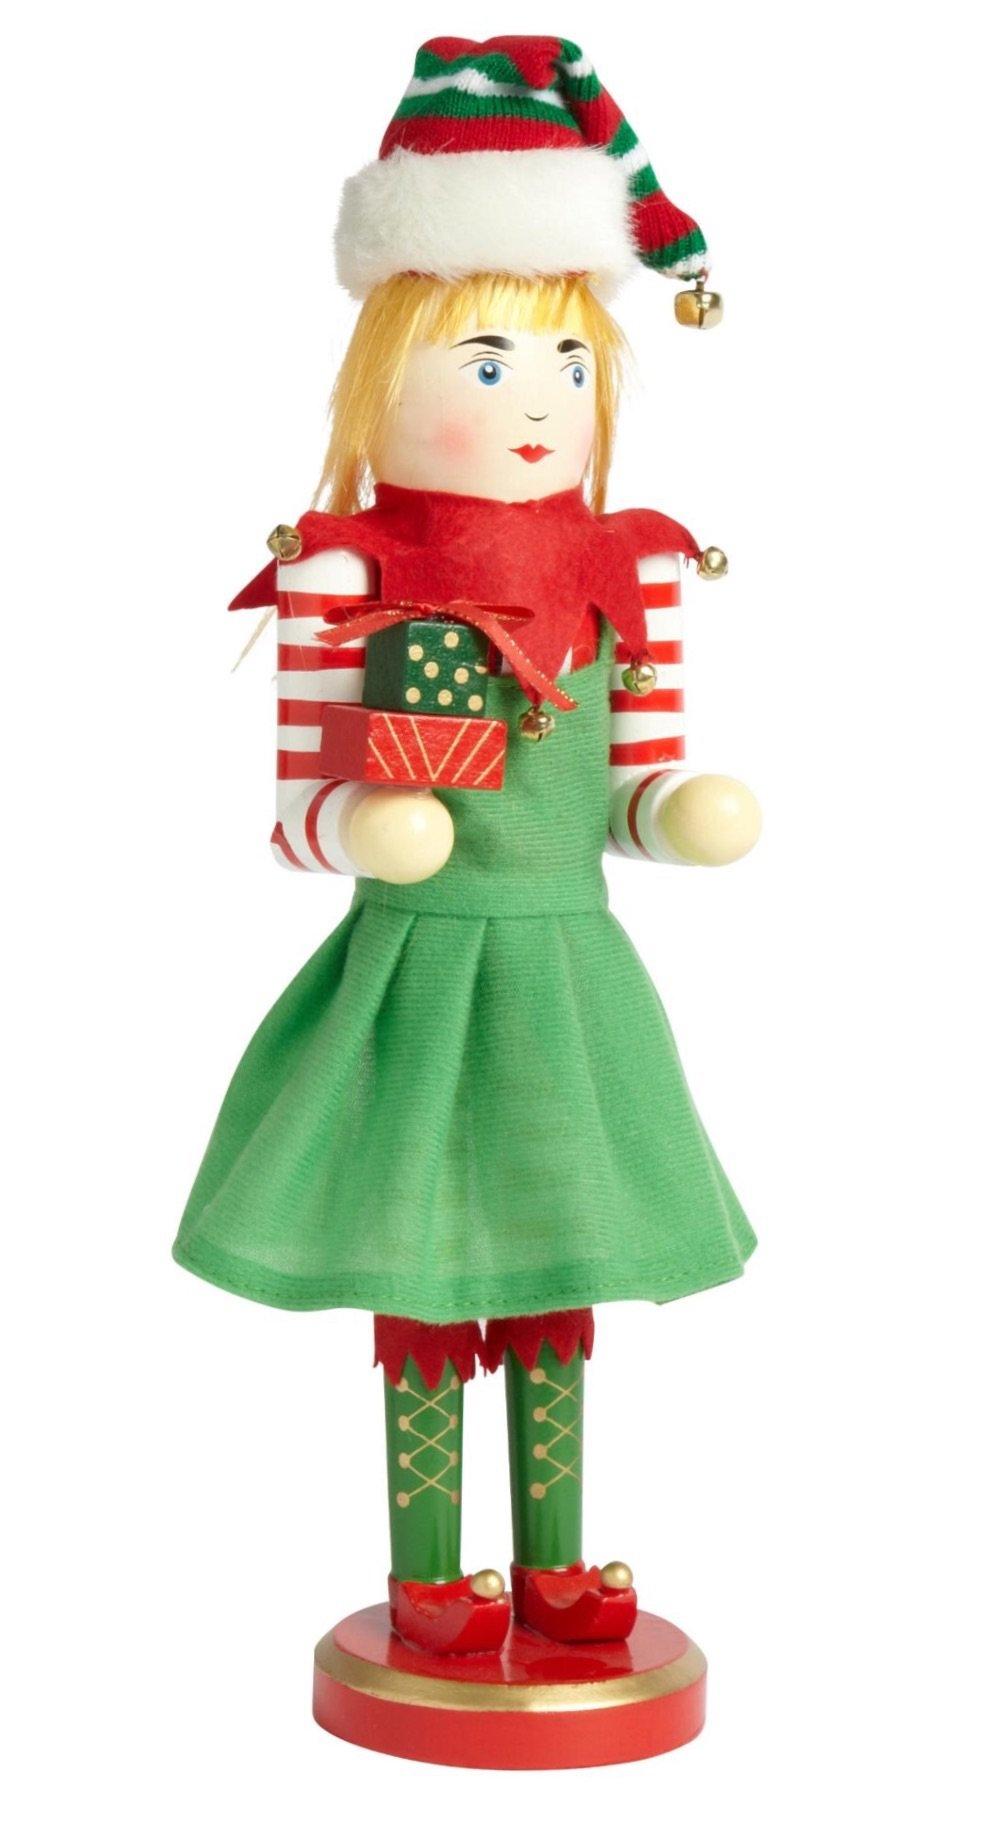 Large Unique Themed Decorative Holiday Season Wooden Christmas Nutcracker - Santa Elf Girl